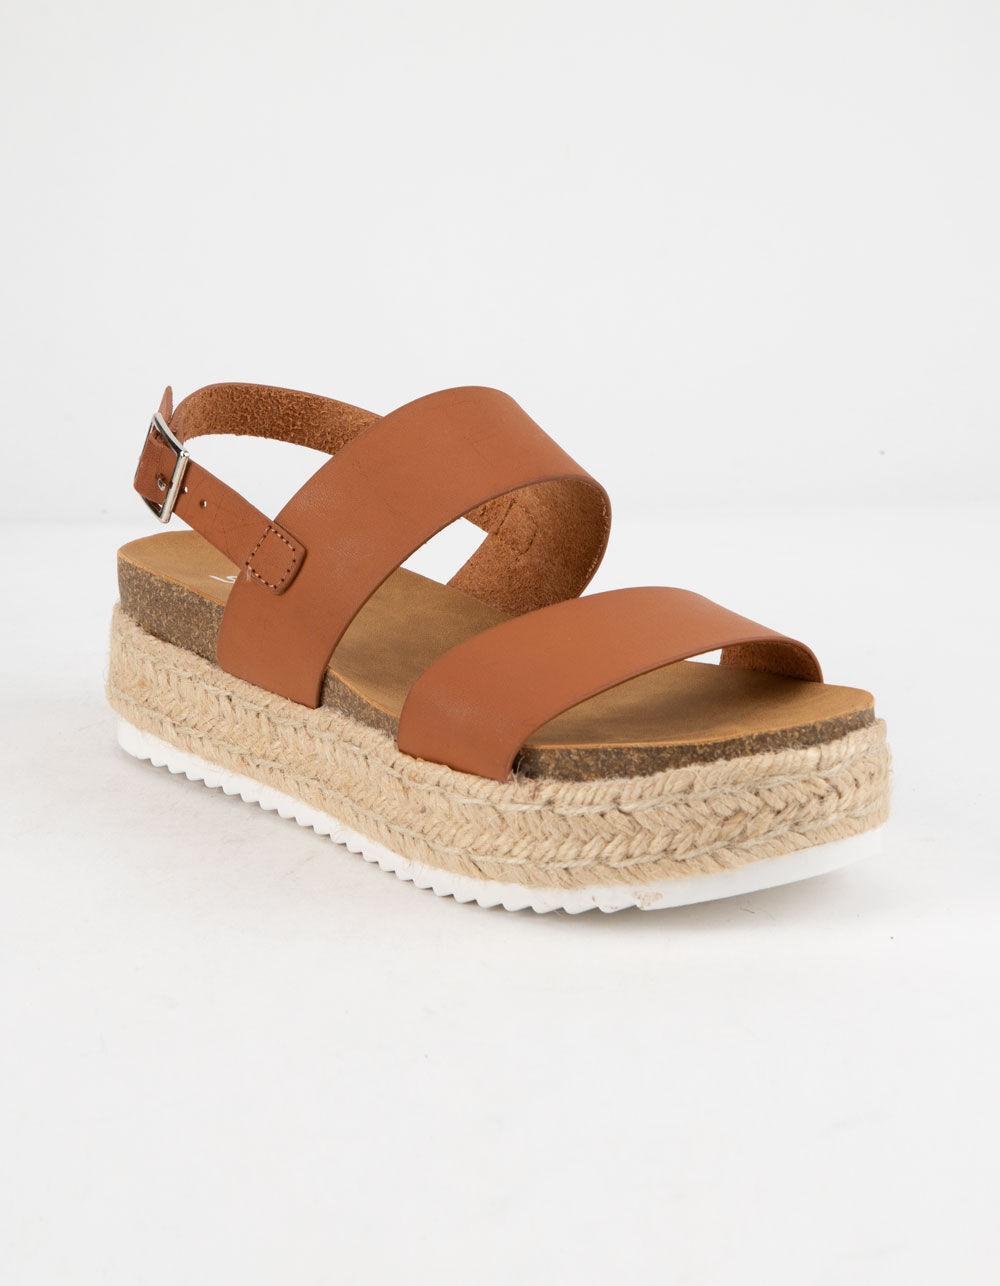 SODA 2 Strap Tan Espadrille Flatform Sandals